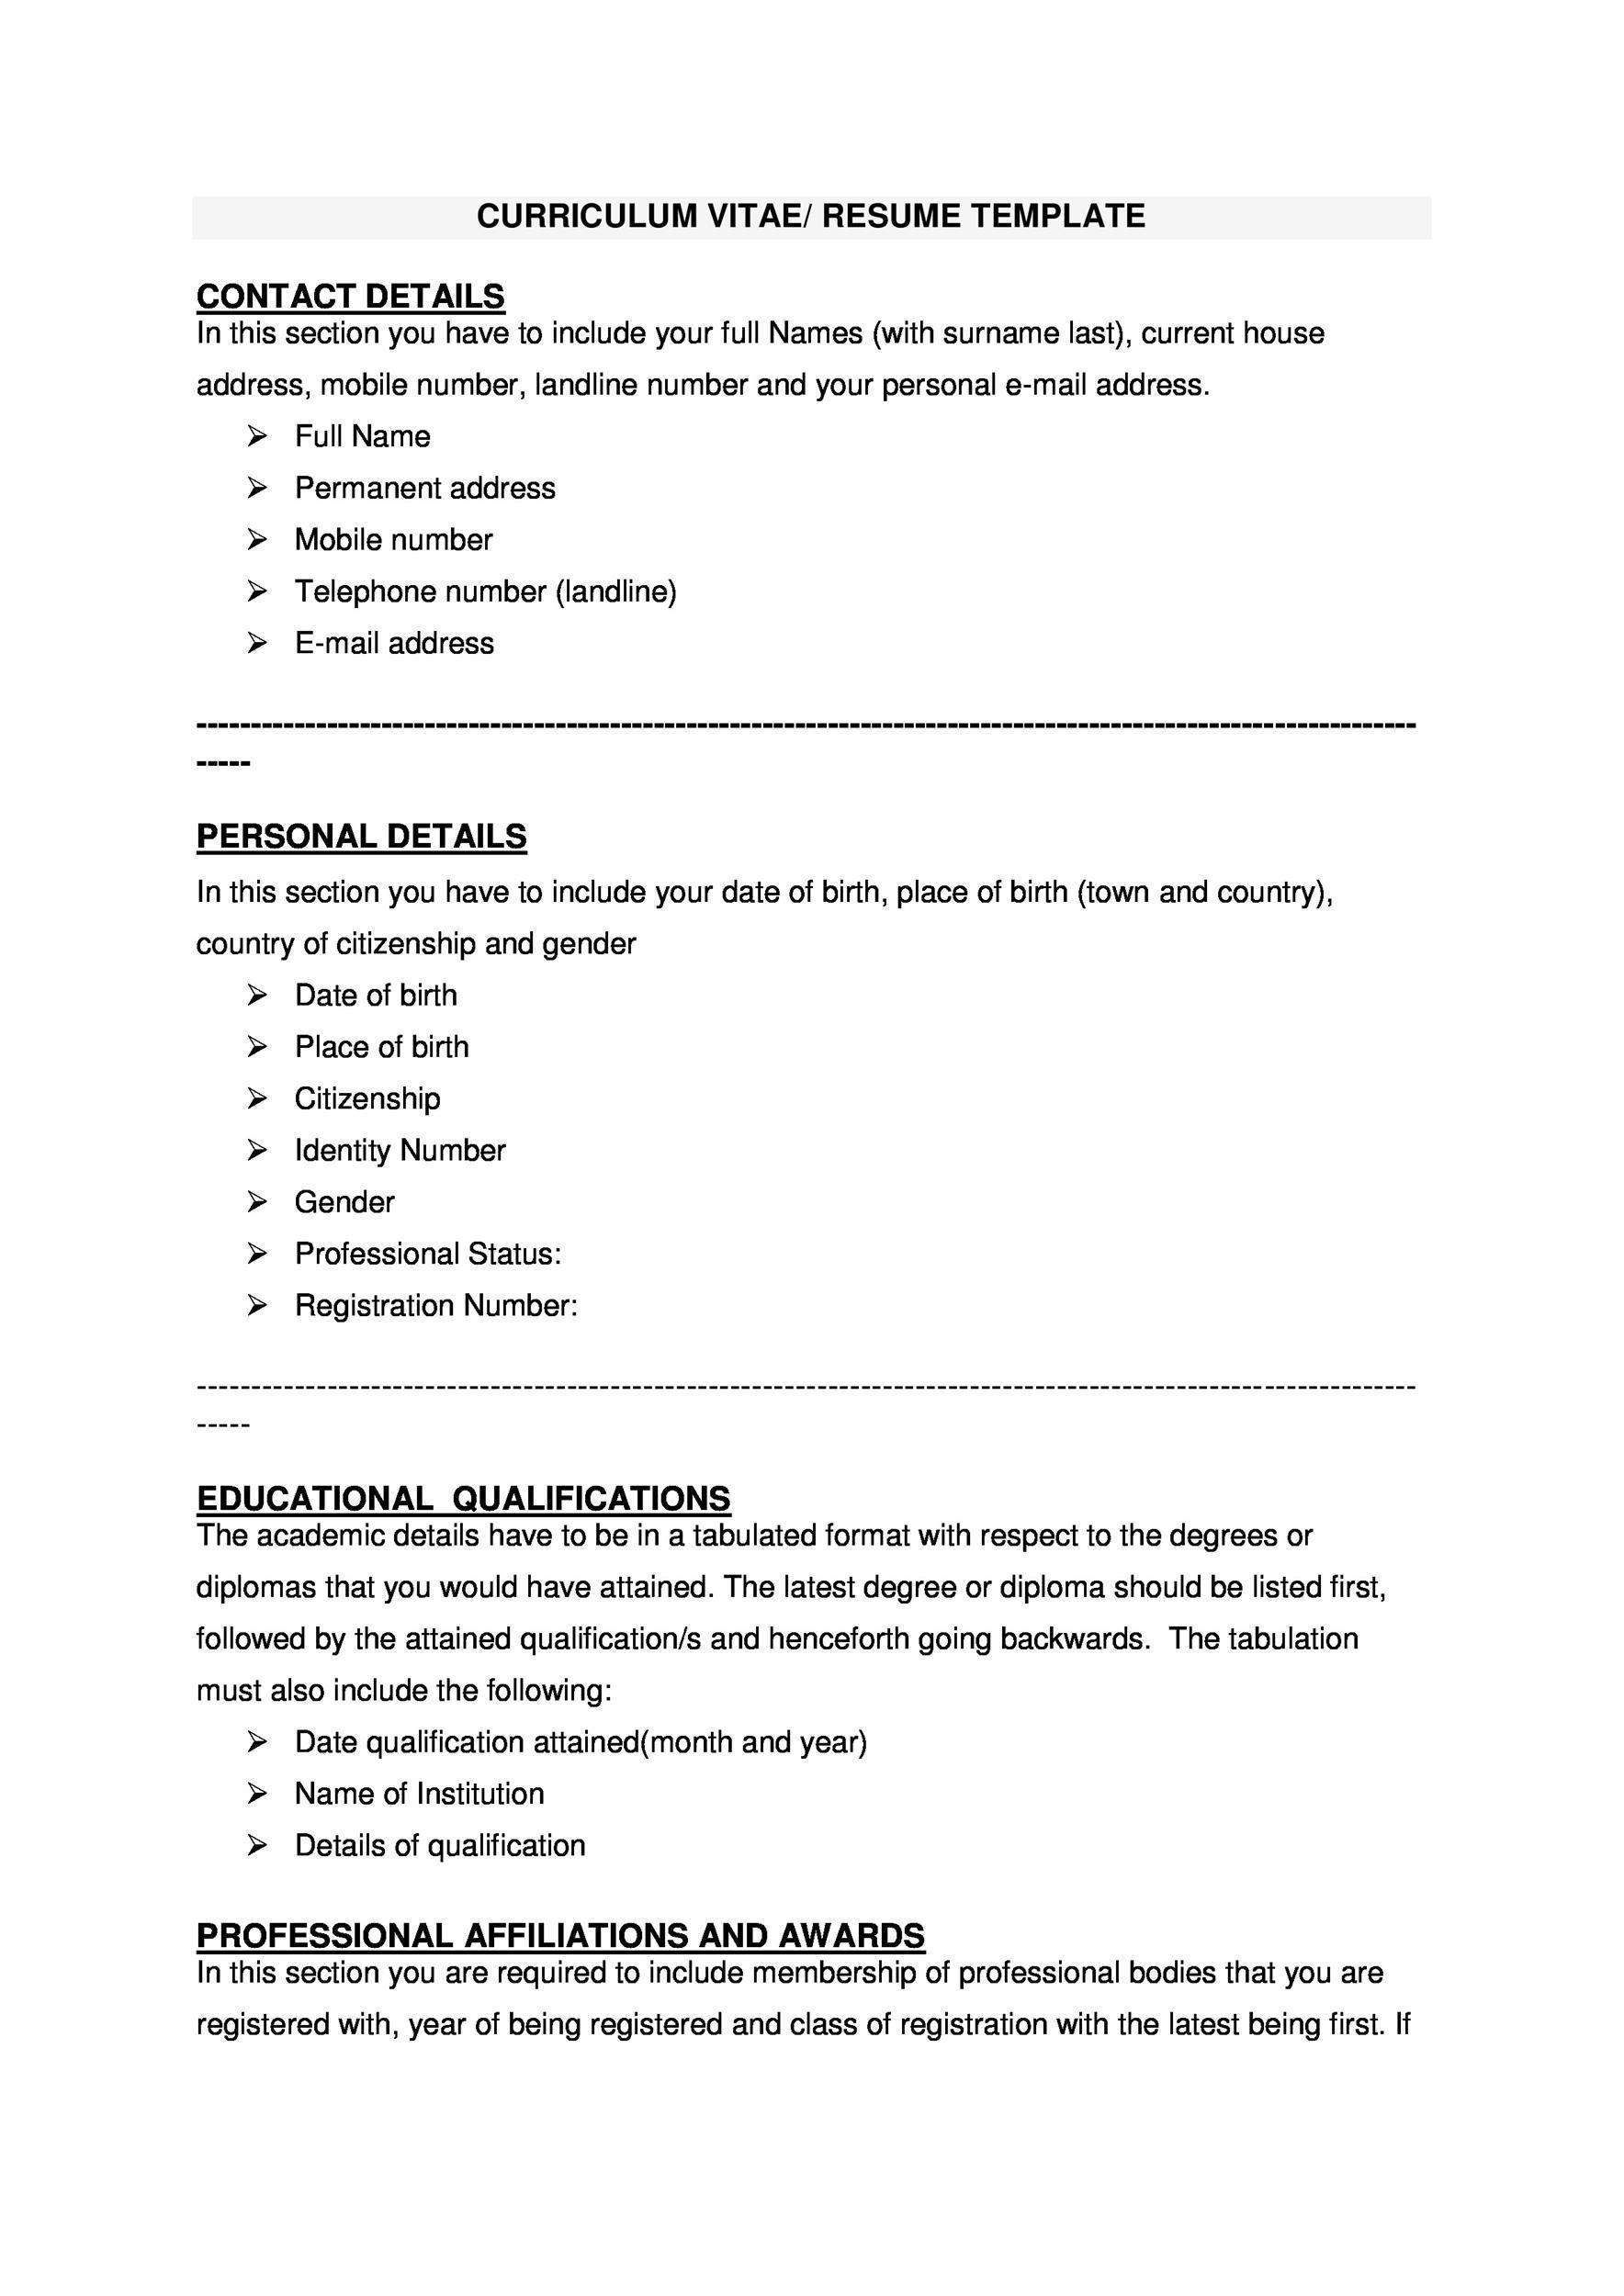 Free curriculum vitae template 15